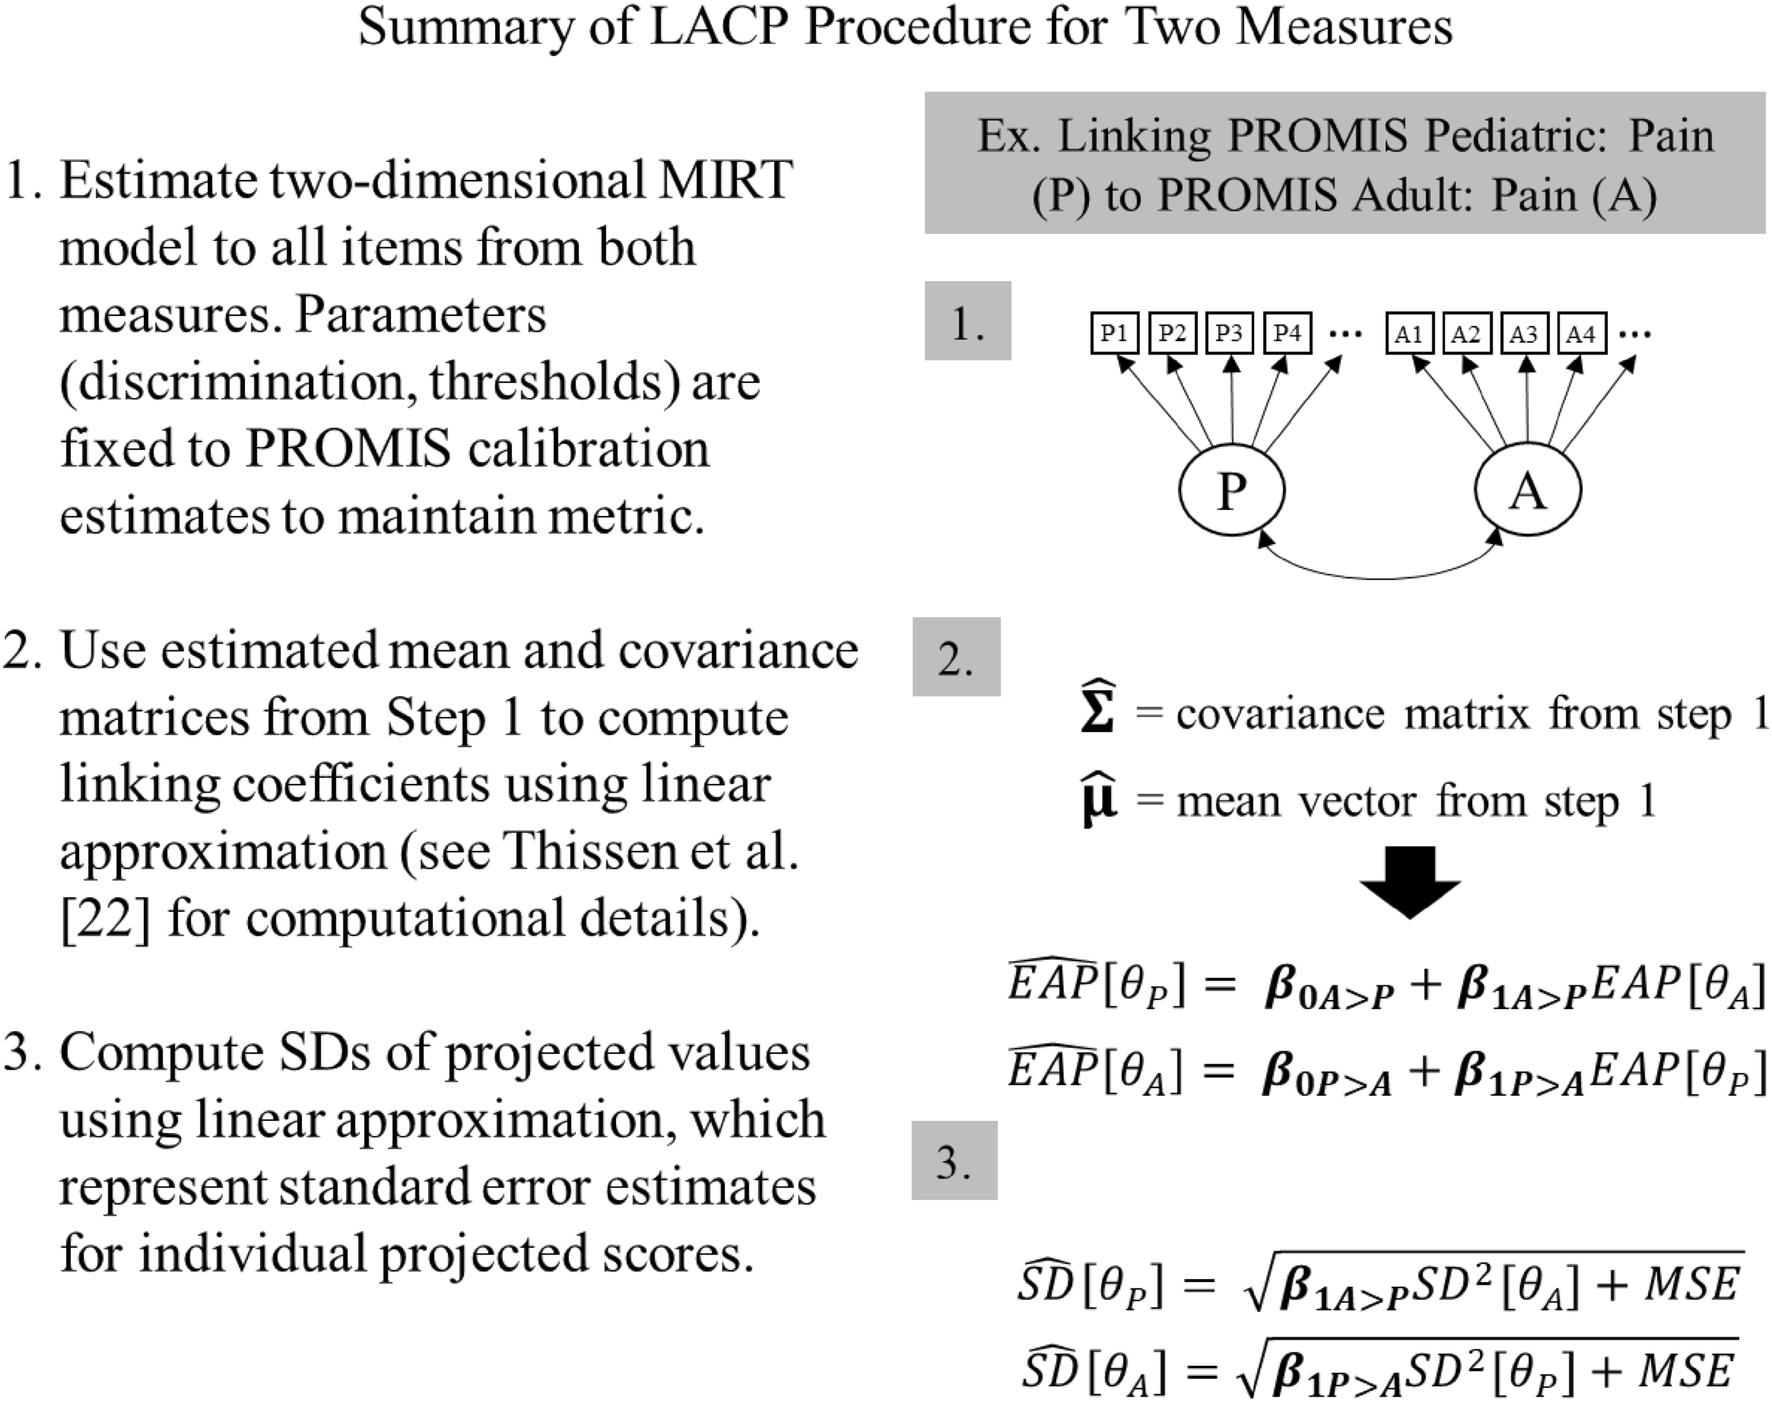 Determining a transitional scoring link between PROMIS